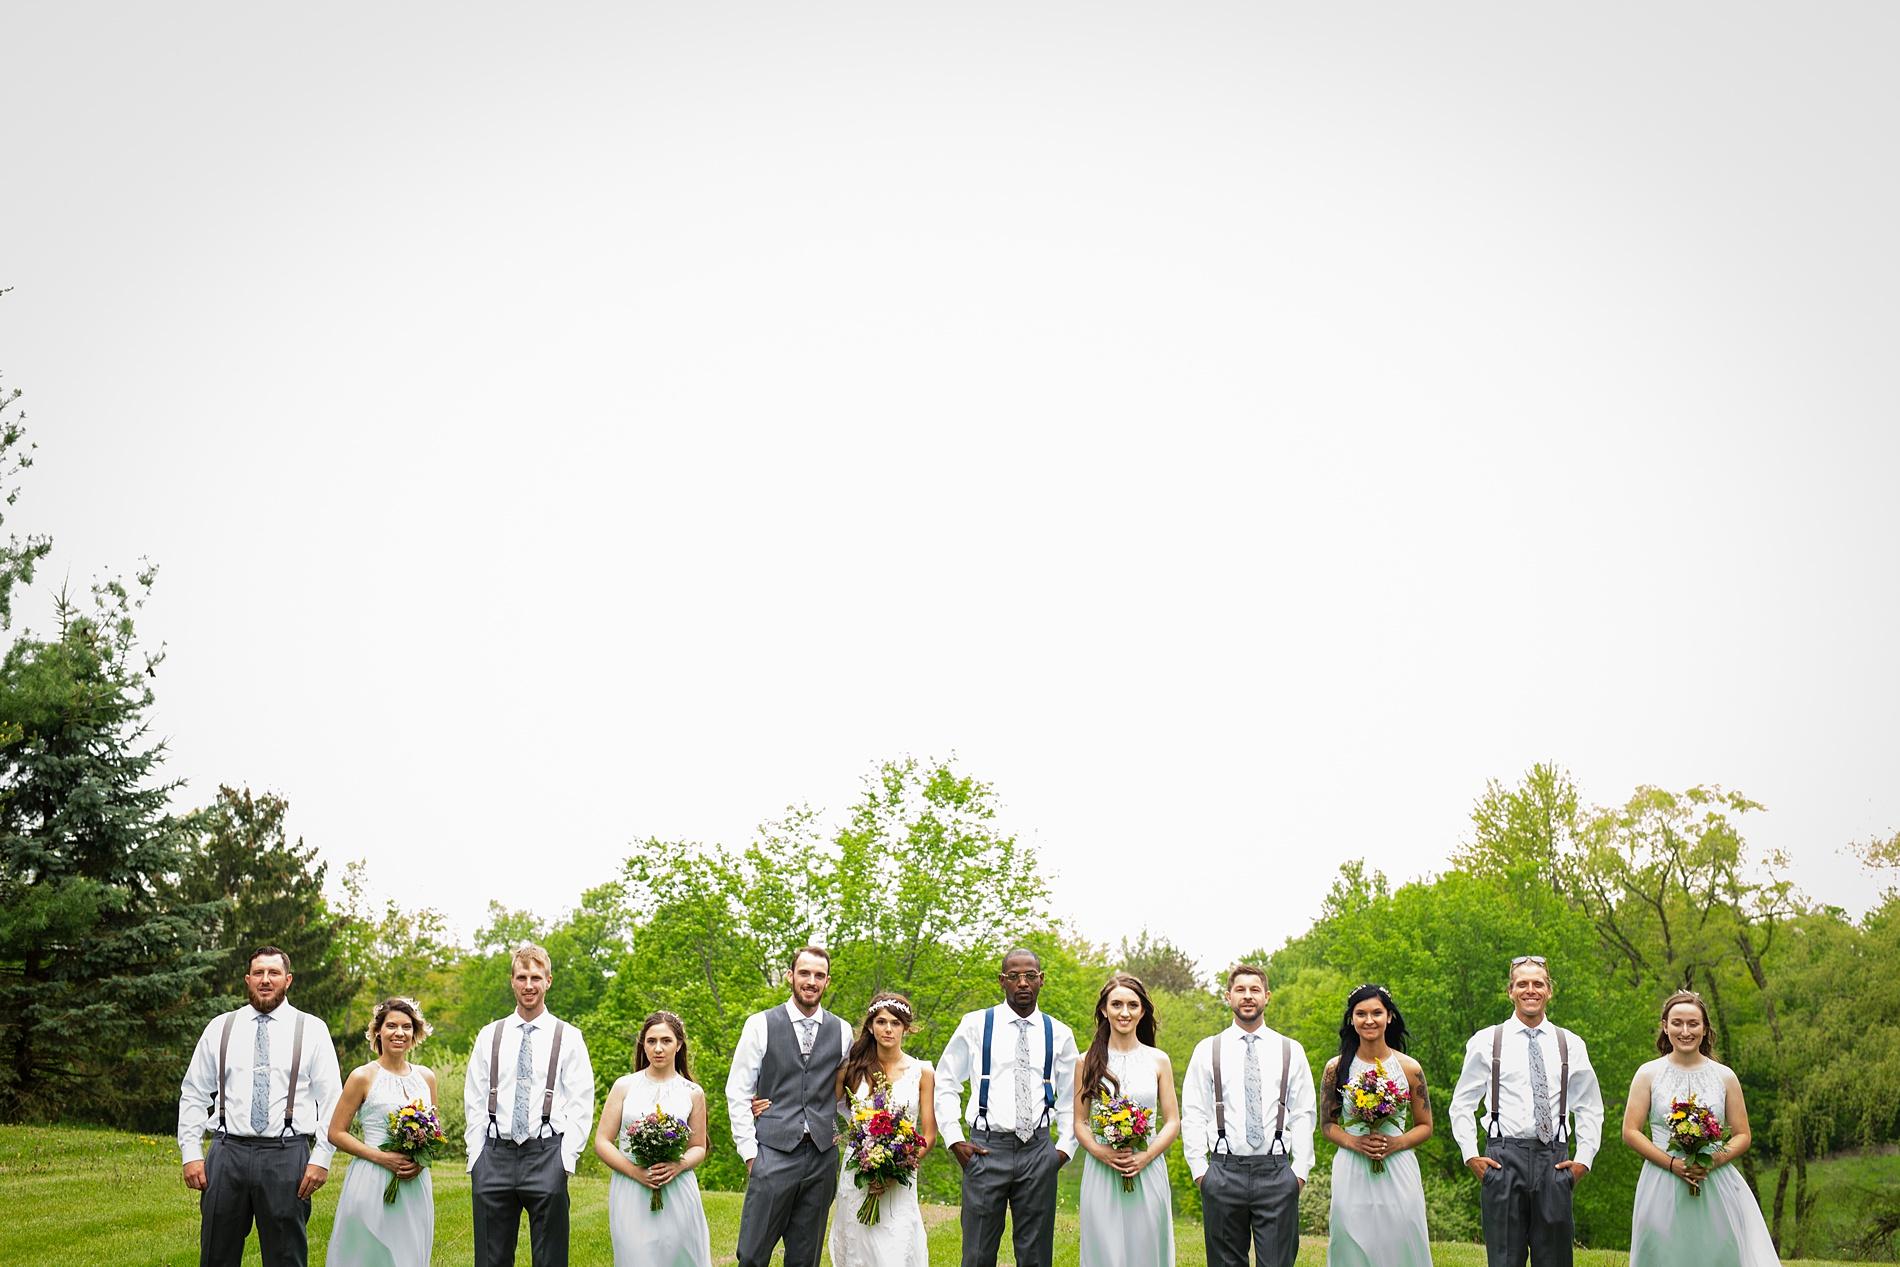 Brandon_Shafer_Photography_Brett_Autumn_Wedding_0051.jpg